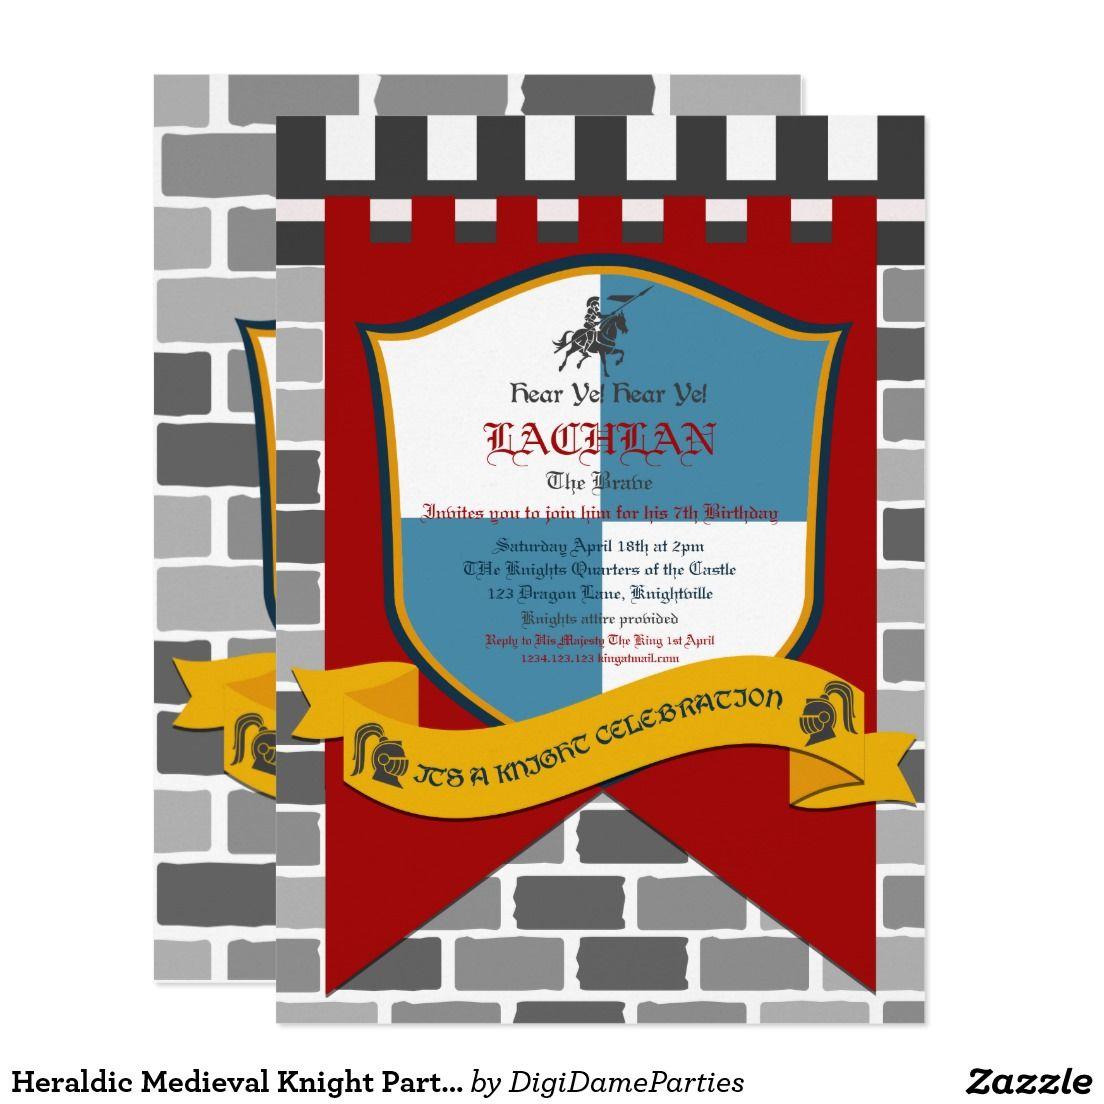 Heraldic Medieval Knight Party Invitation  Zazzle.com  Knight